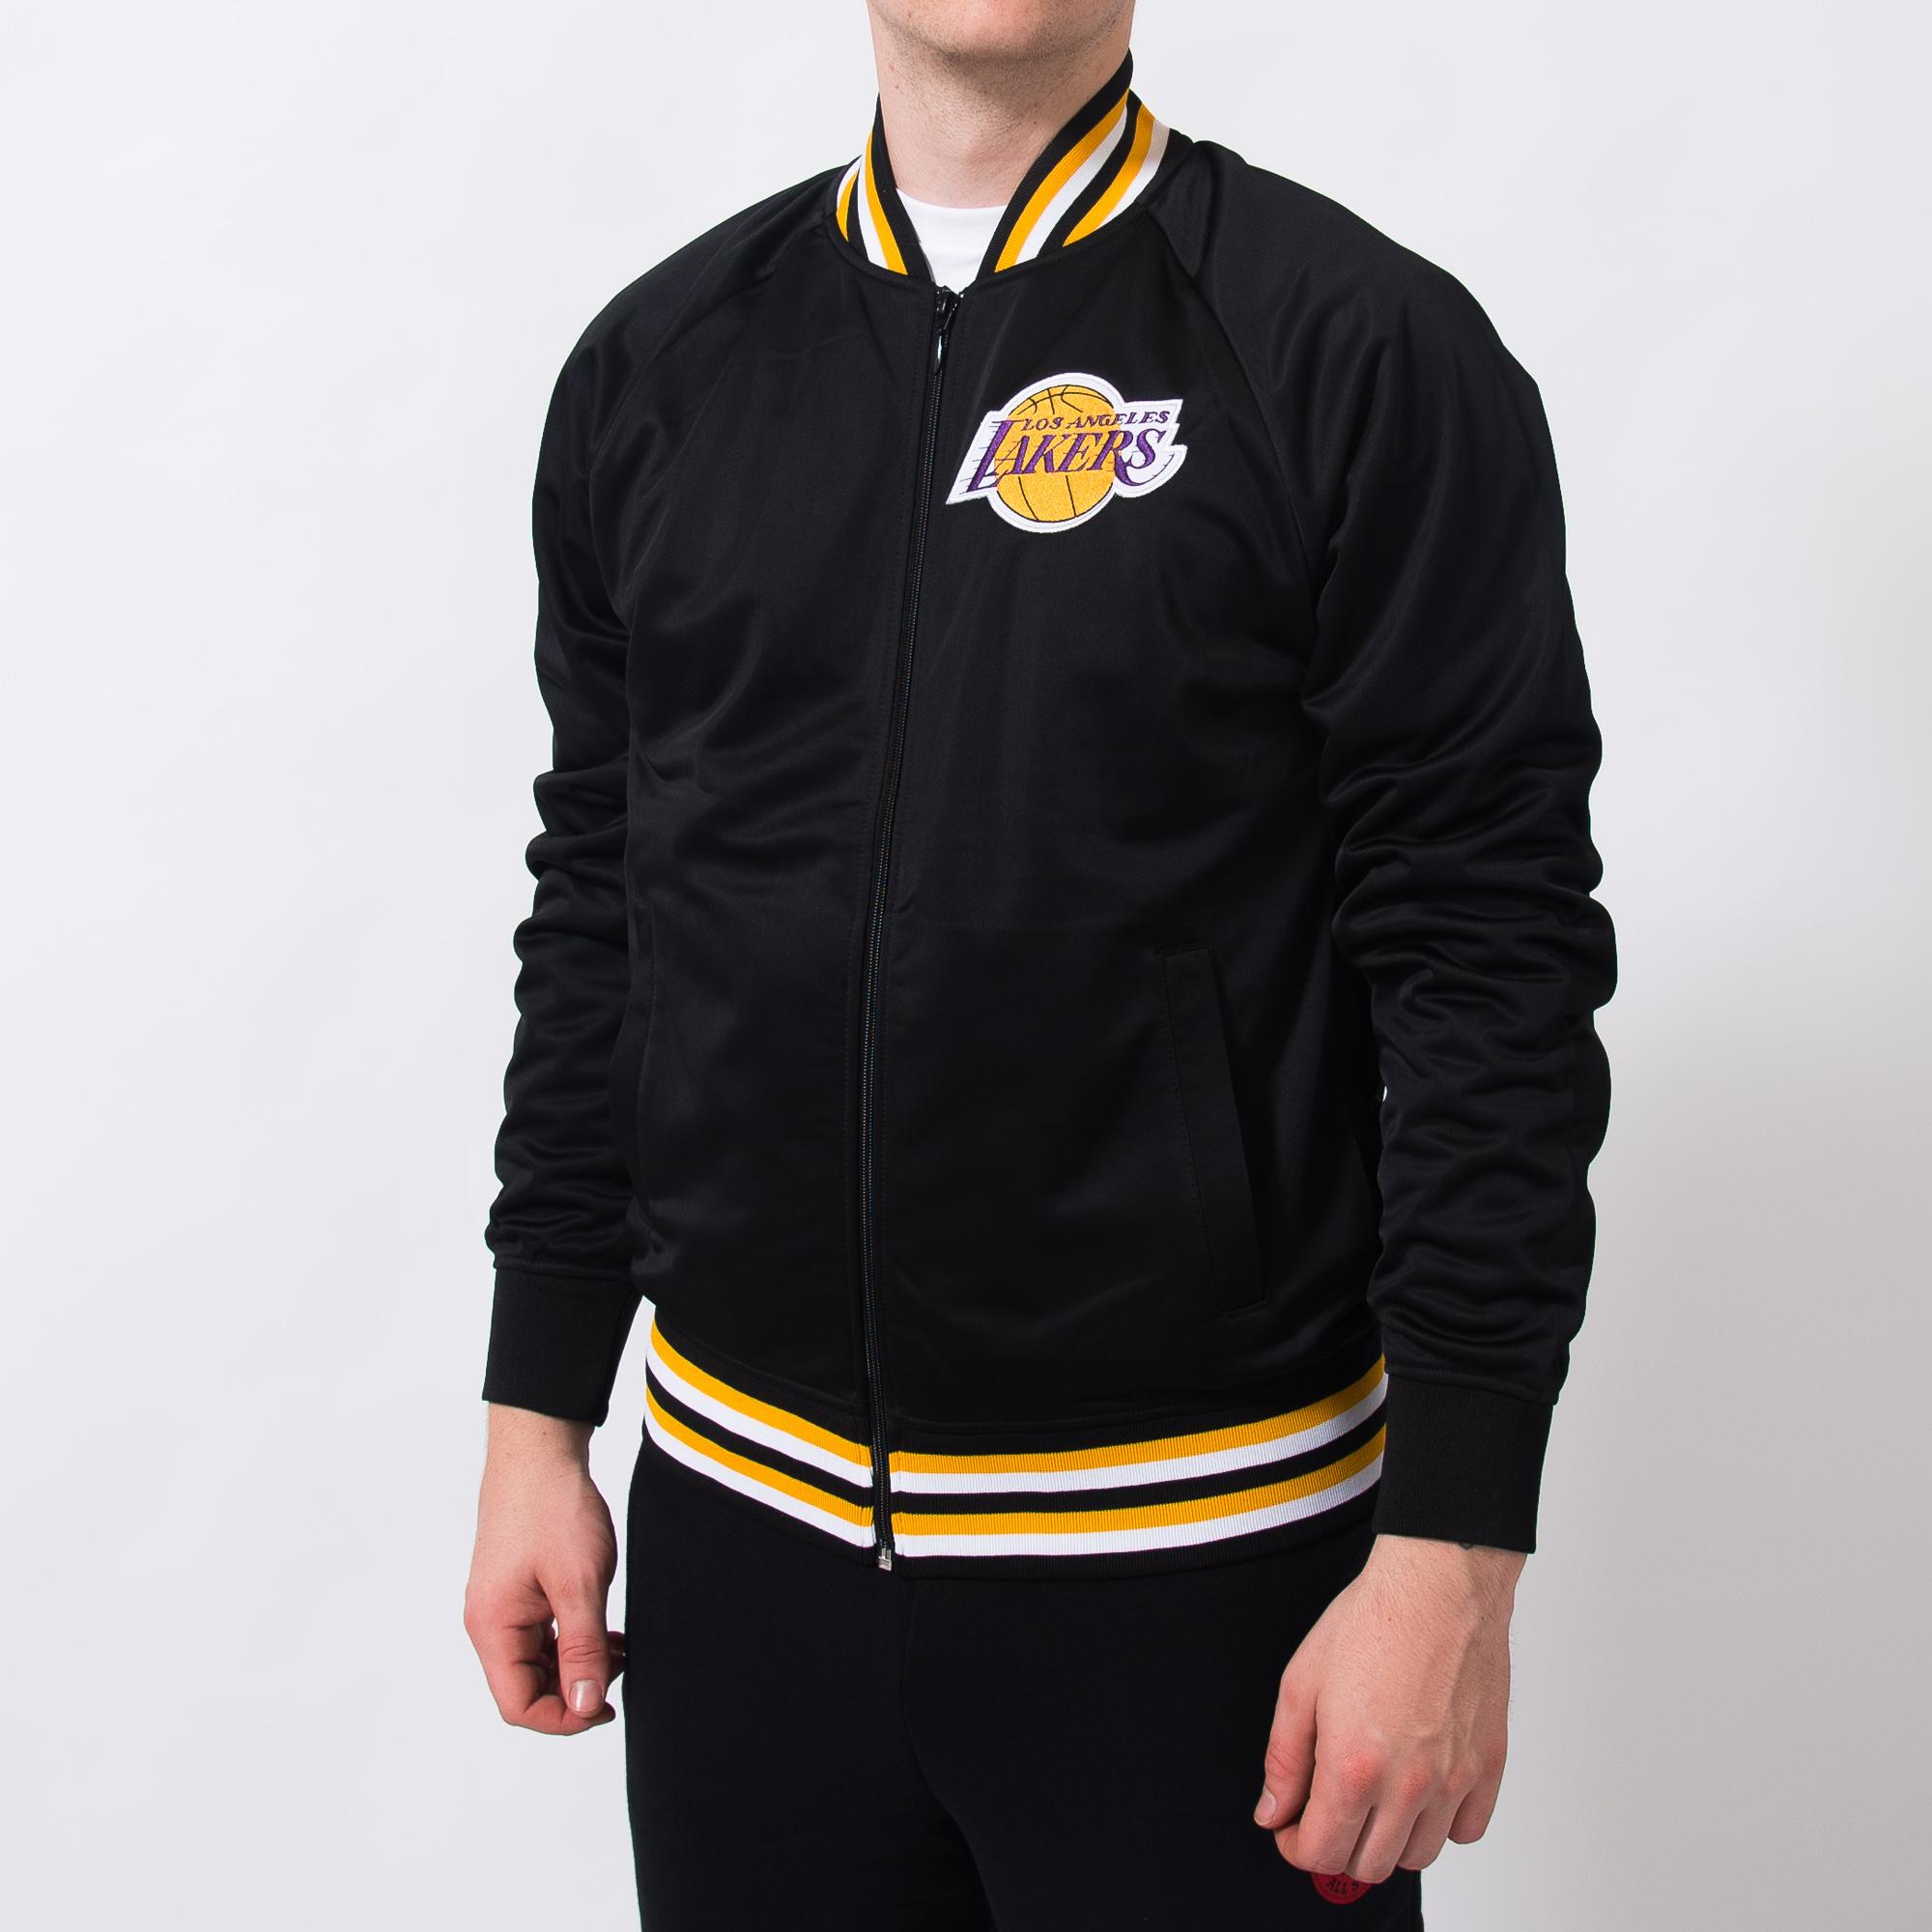 watch 7e374 0b763 Mitchell & Ness NBA Los Angeles Lakers Top Prospect Jacket ...